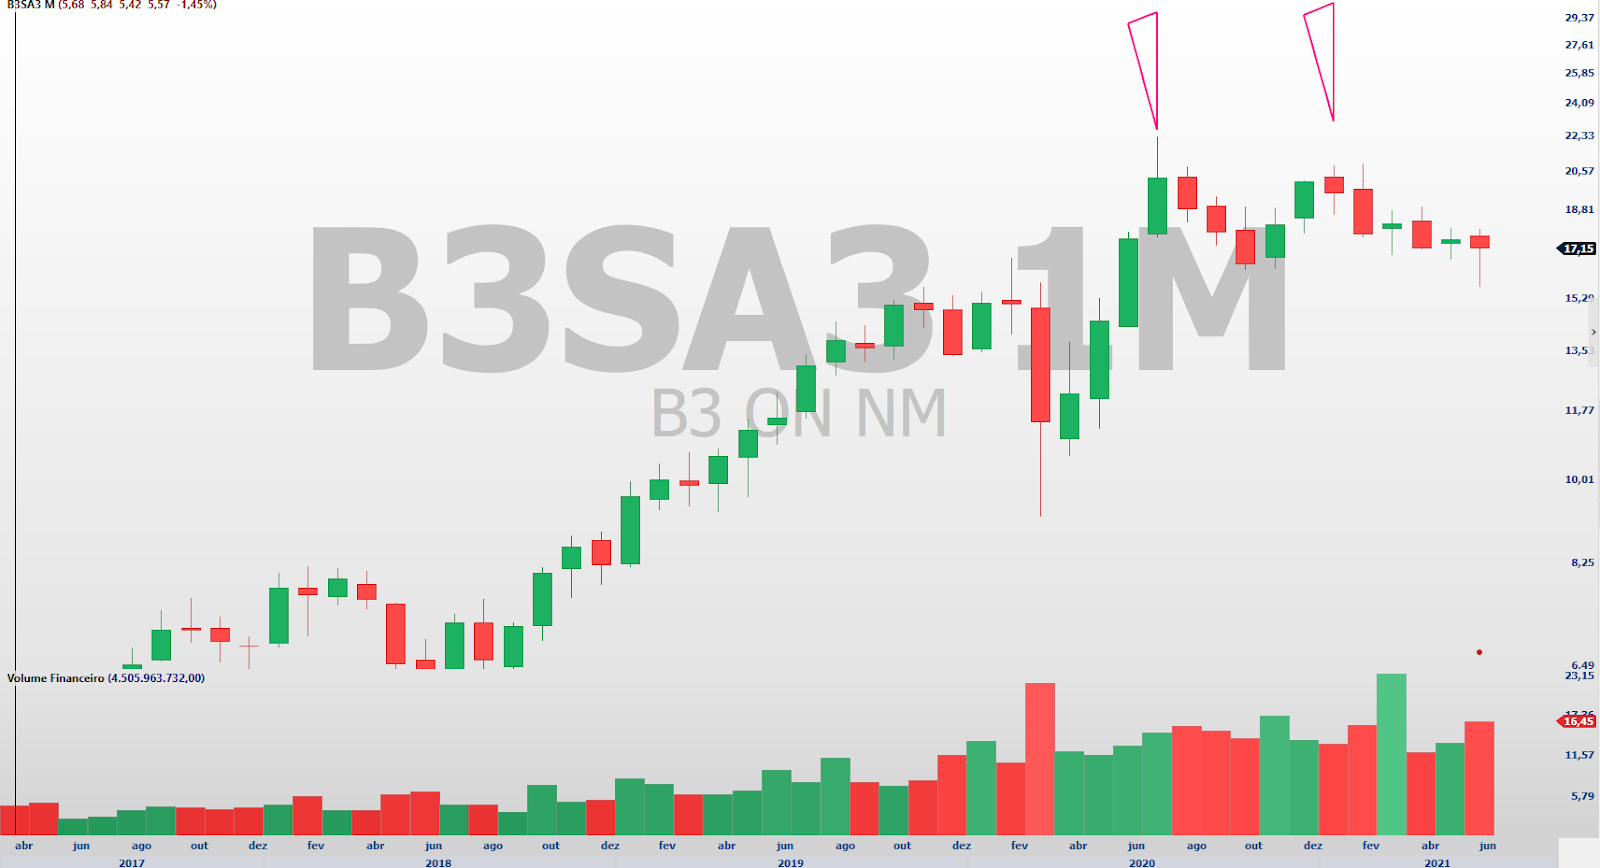 B3 Gráfico Mensal (Fonte: Profit)